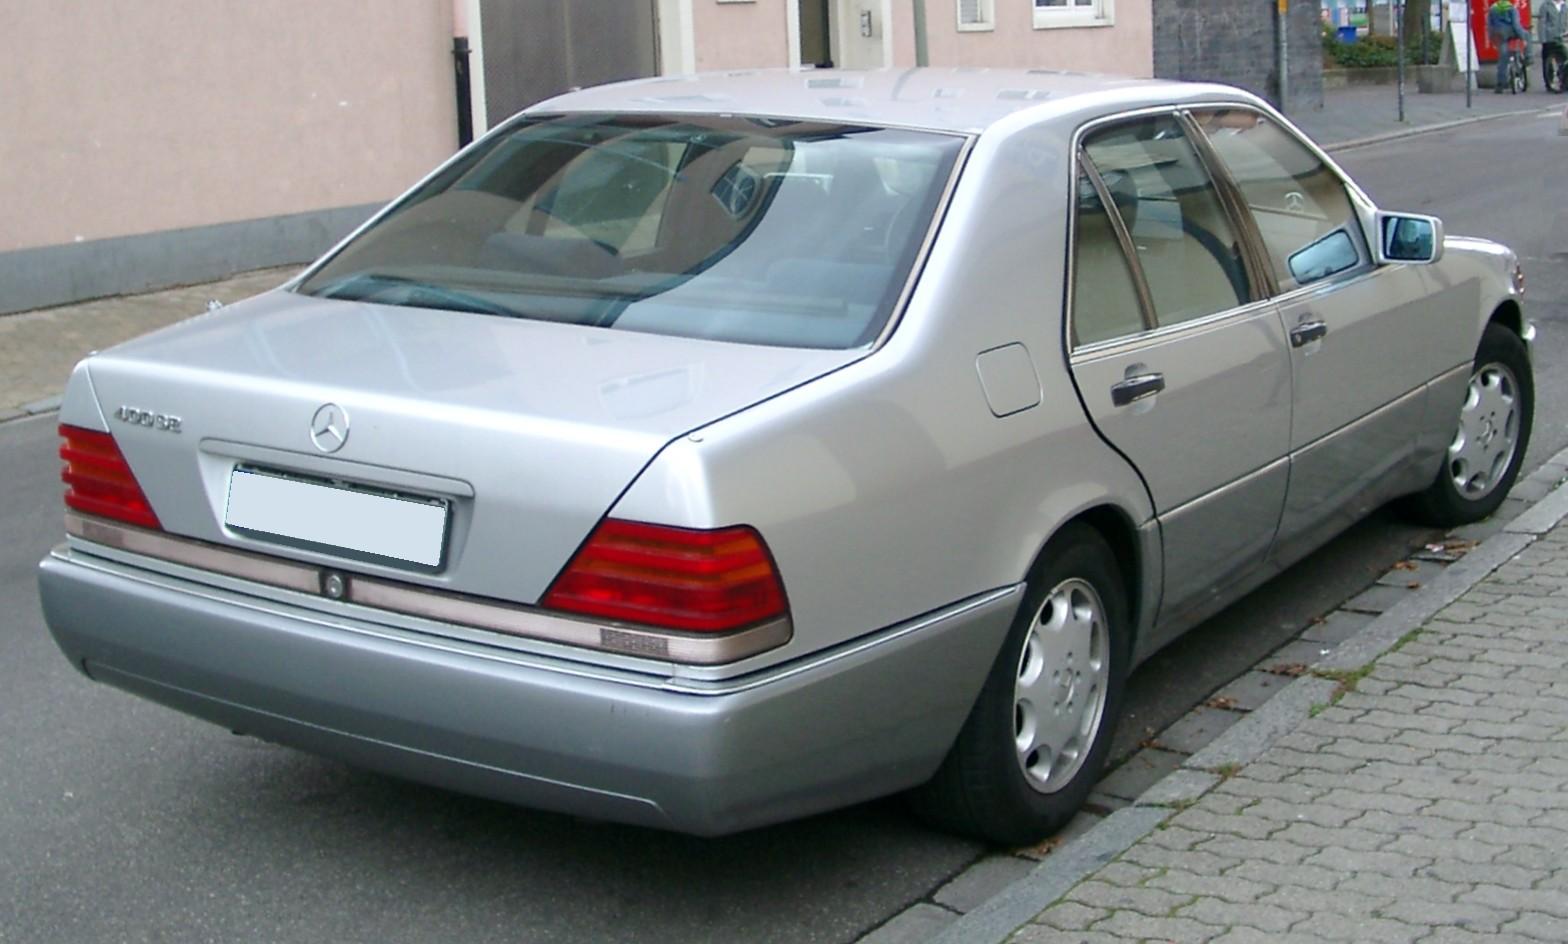 Mercedes-Benz 1992 Brochure - 74 pp - 9x12 inches -- 300 Class